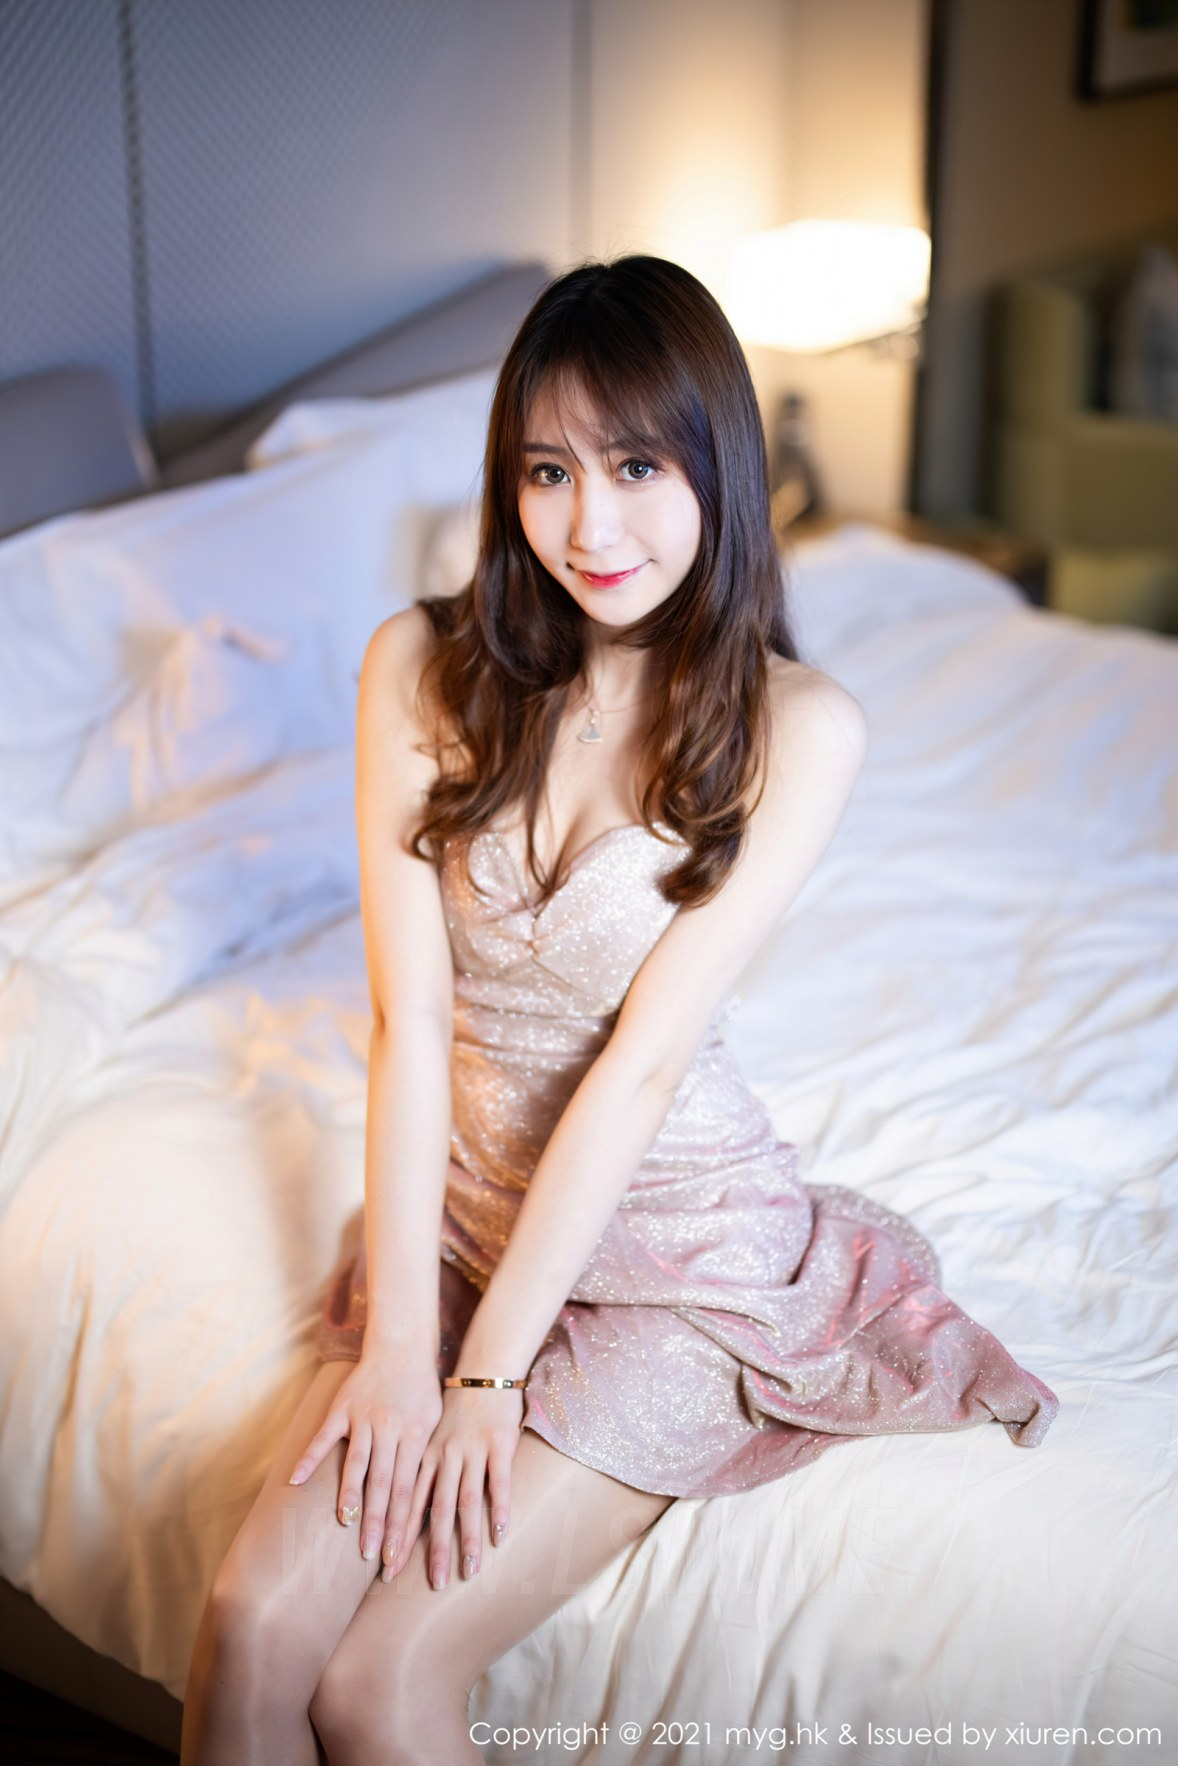 MyGirl 美媛馆 Vol.577 吊裙与丝袜 水水er 性感写真11 - 4